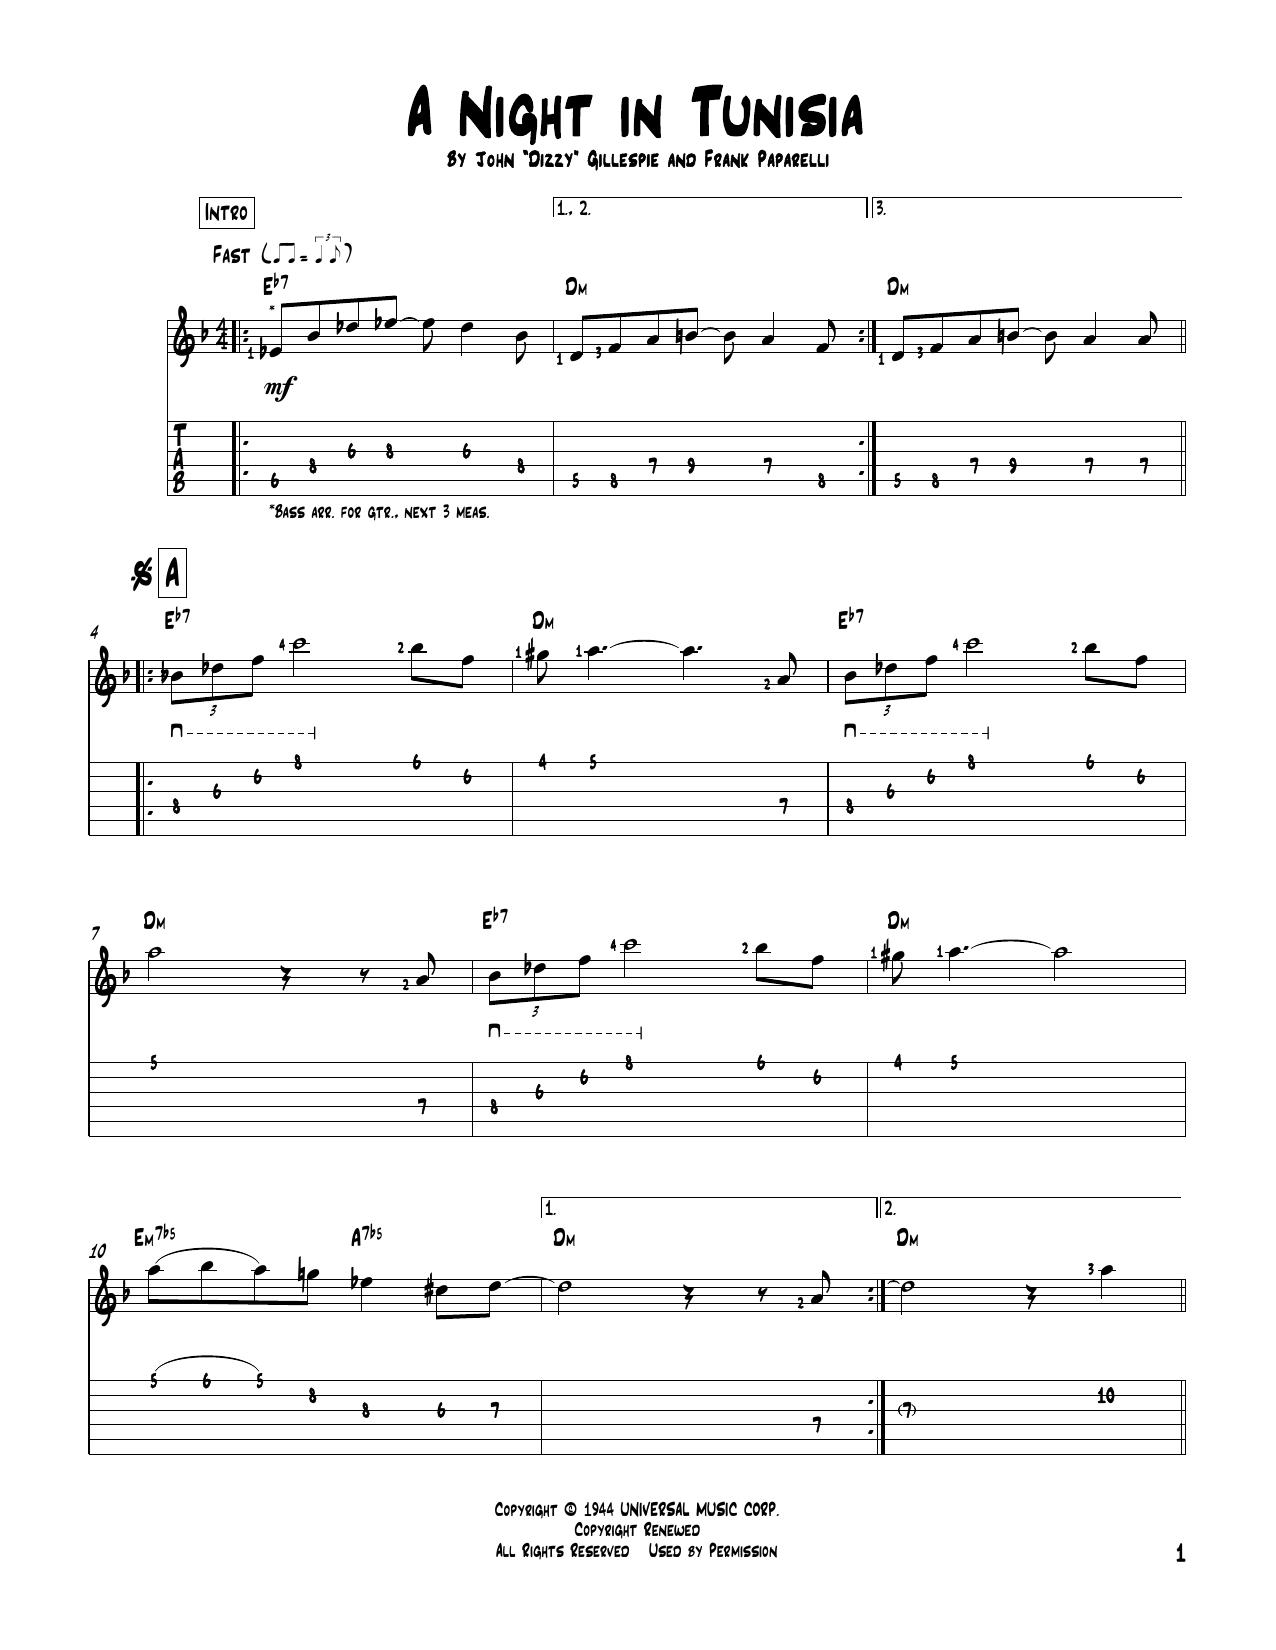 A Night in Tunisia - Learn Jazz Standards